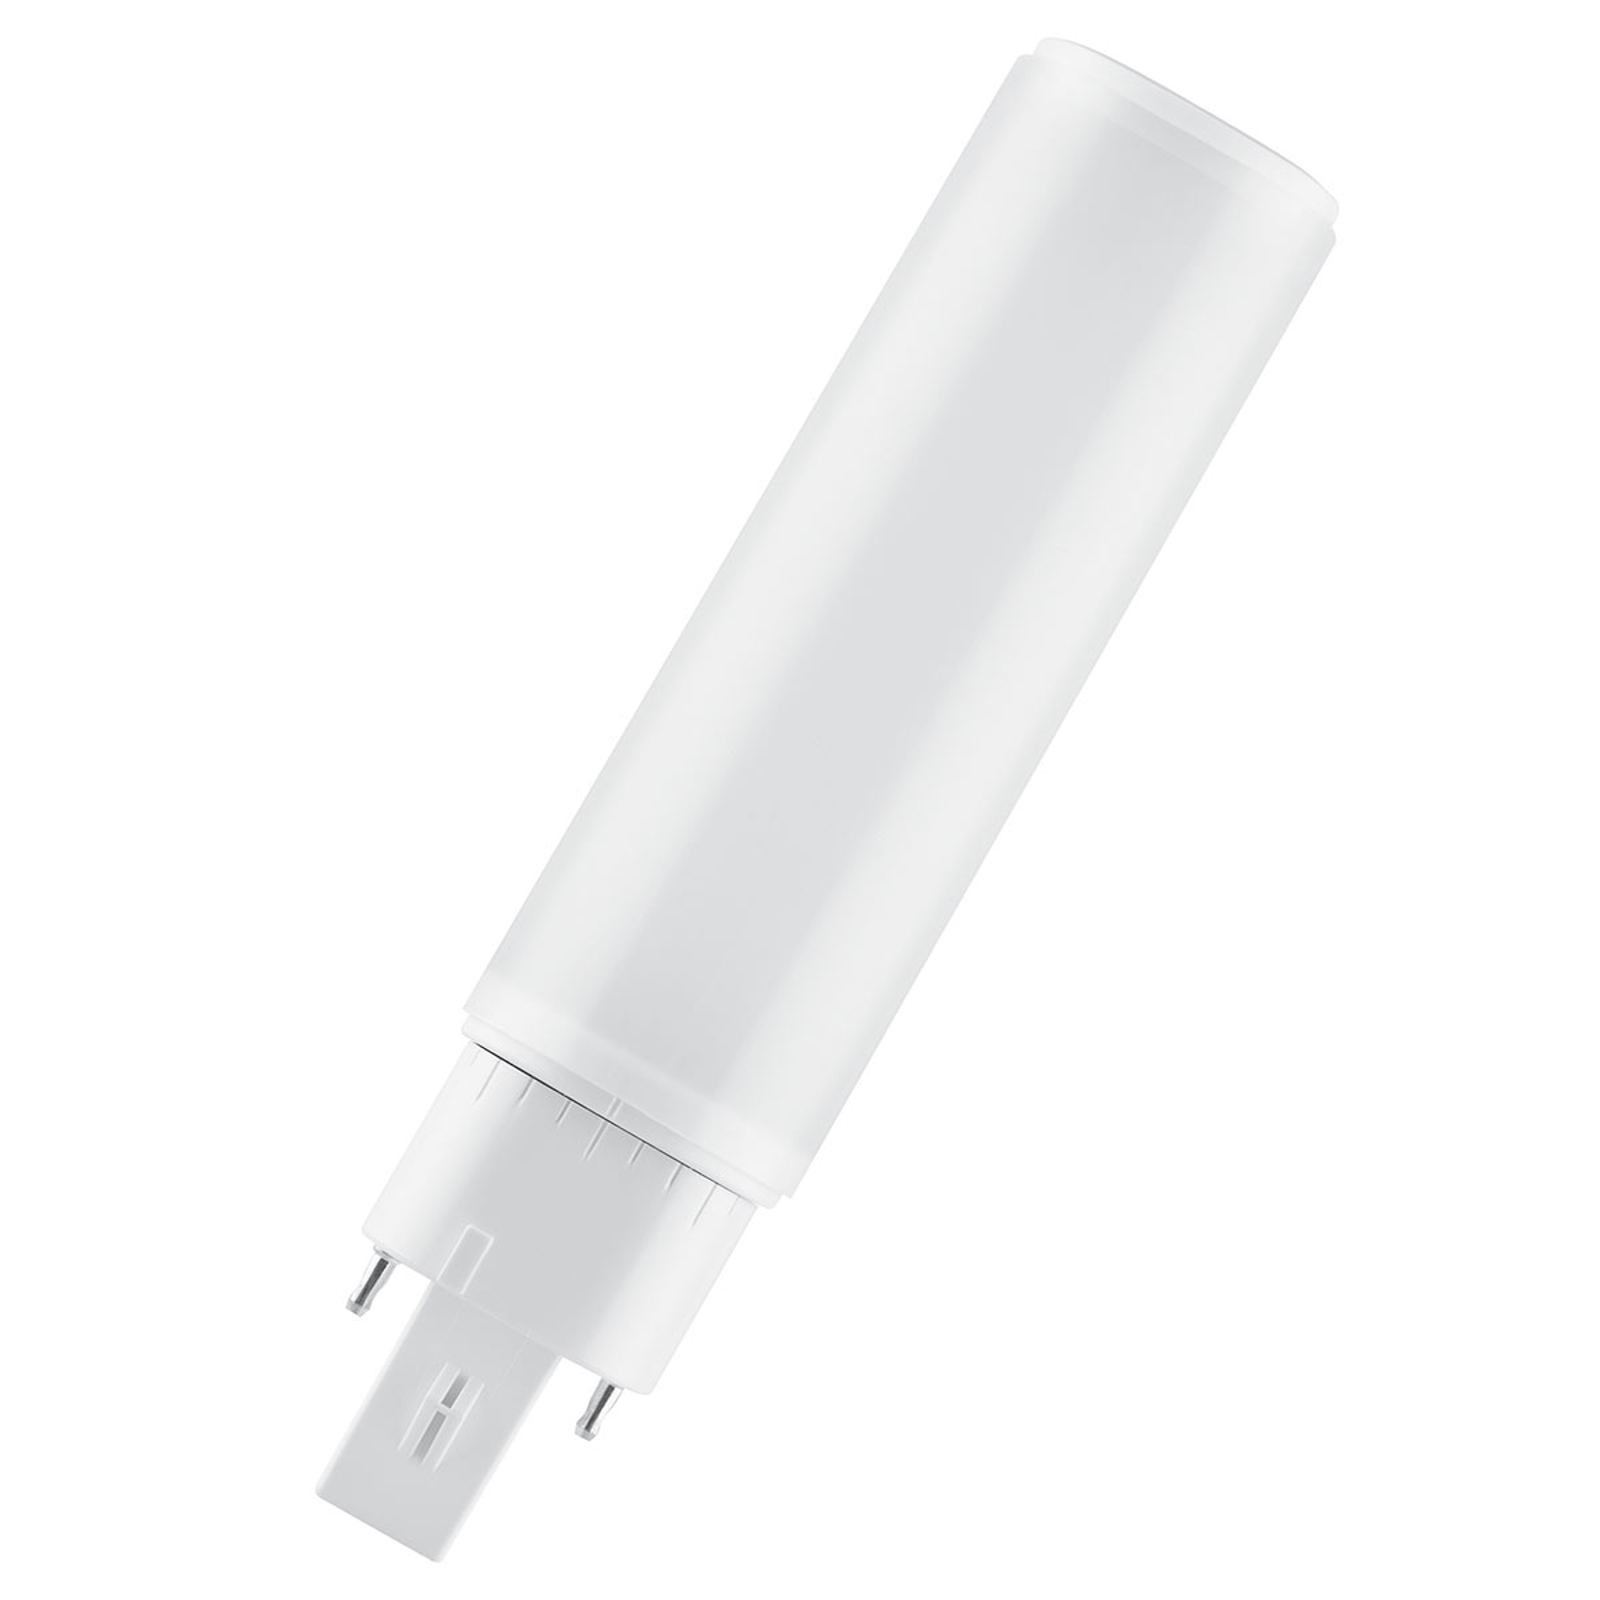 OSRAM LED-Lampe G24q-2 7W 4.000K